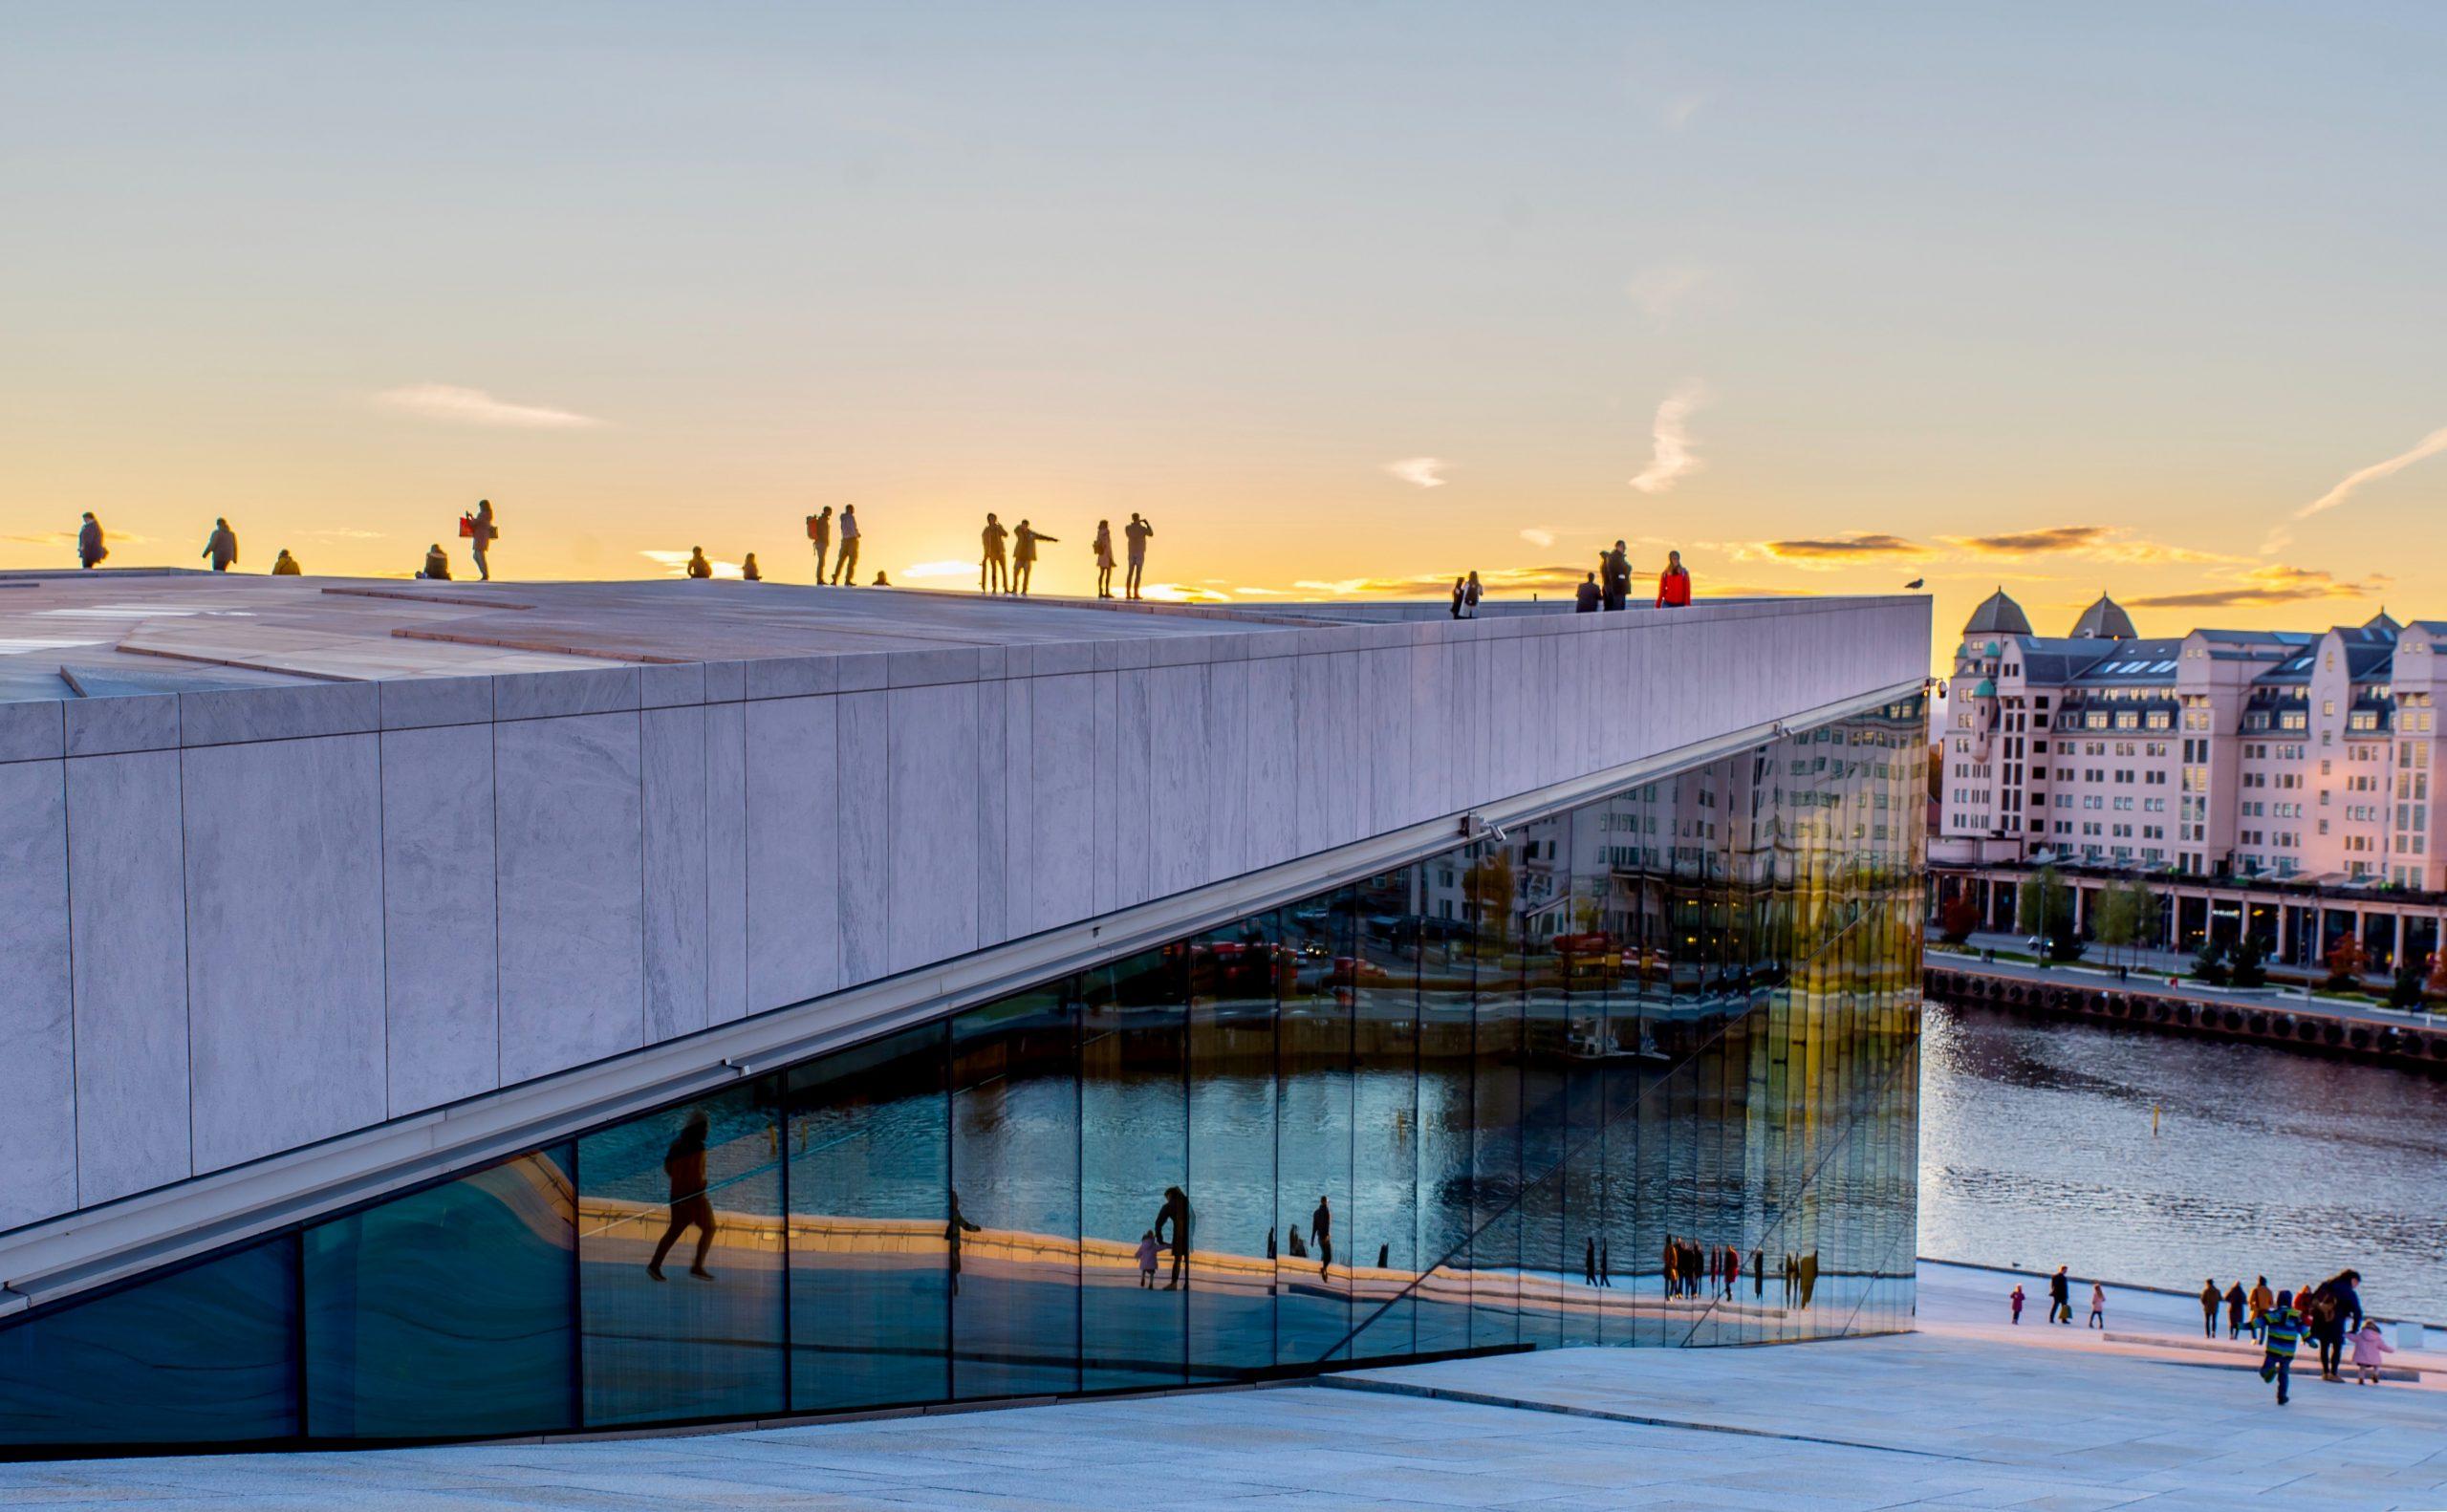 oslo airport to city, oslo airport to city center, oslo airport bus, train oslo airport to city, How To Get From Oslo Airport to City Center